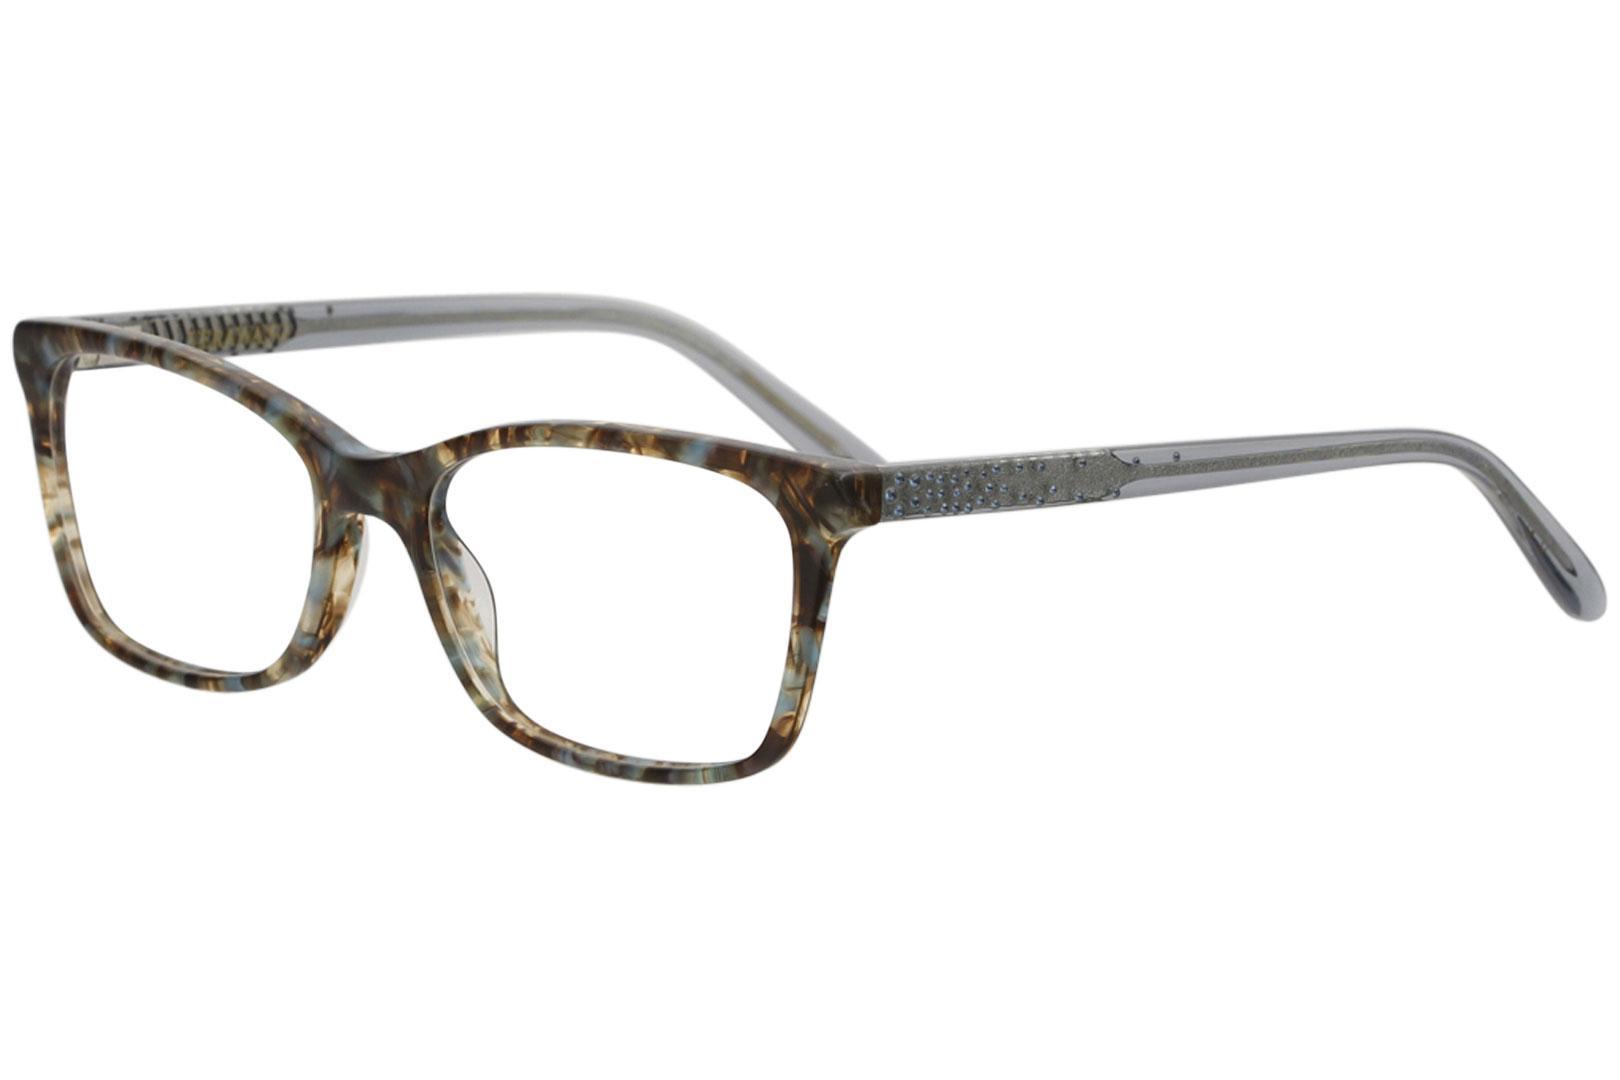 5246bfbe817 Vera Wang Eyeglasses Silvia Full Rim Optical Frame by Vera Wang. Touch to  zoom